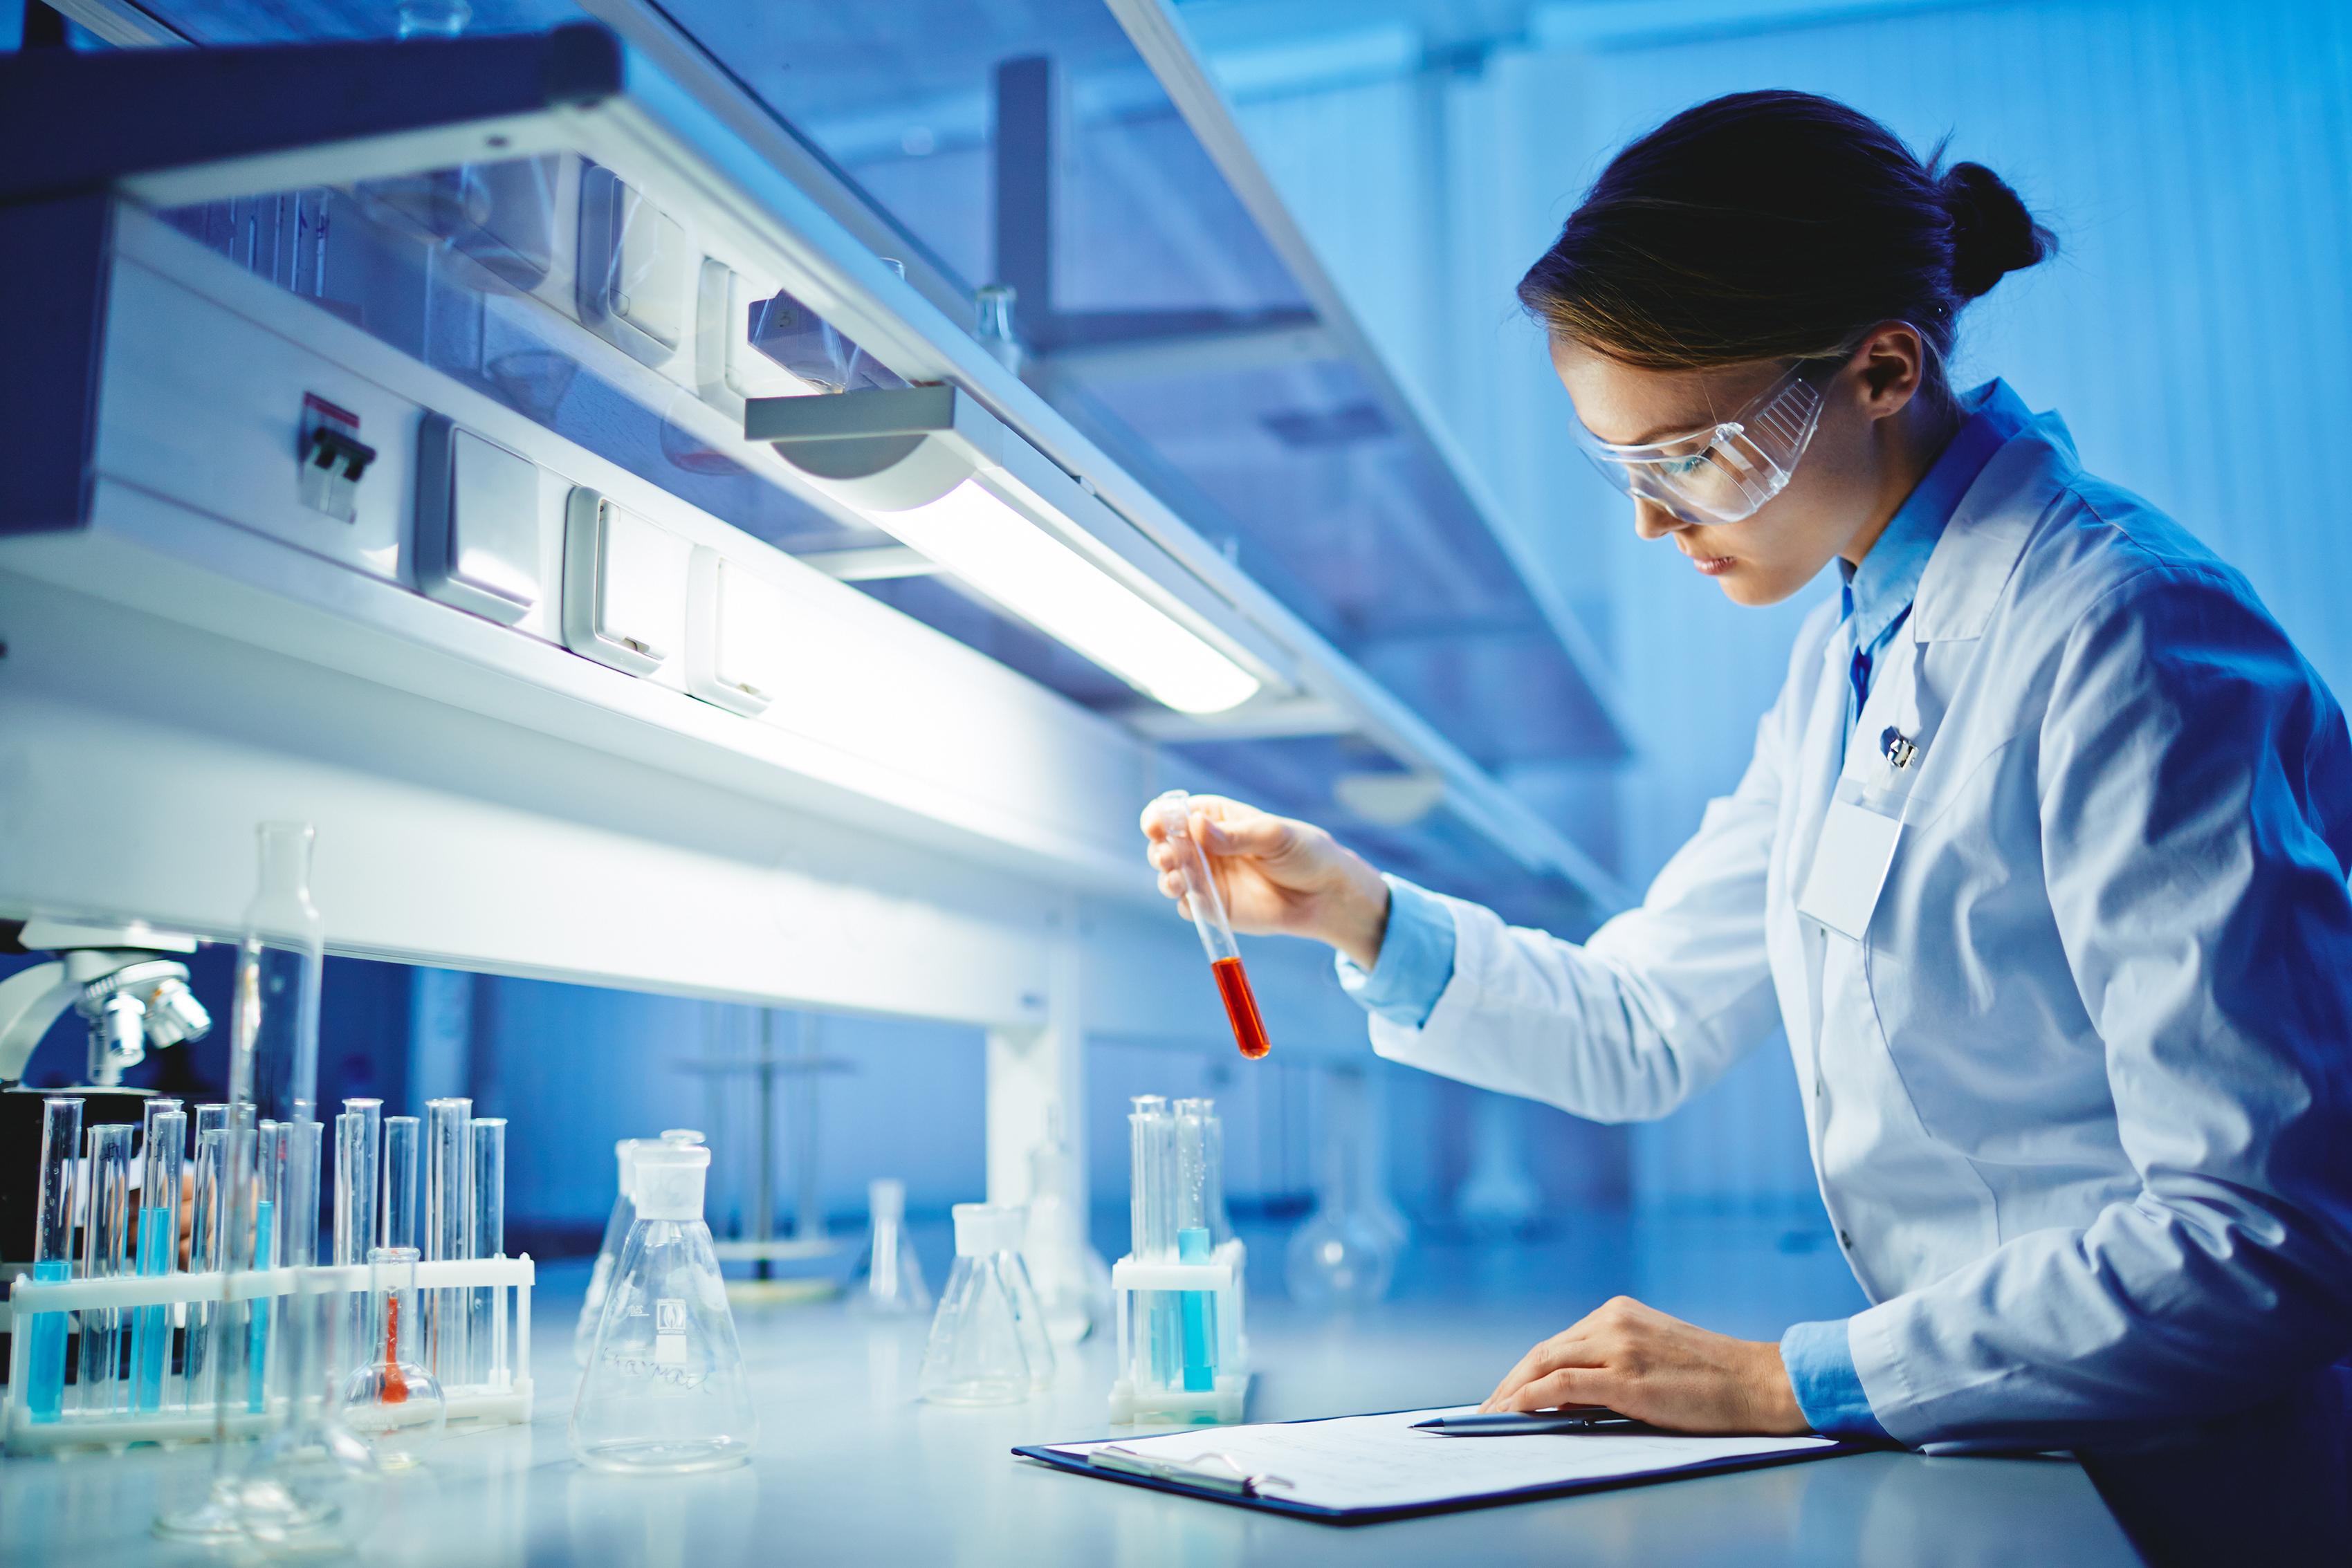 Types of Biotechnology